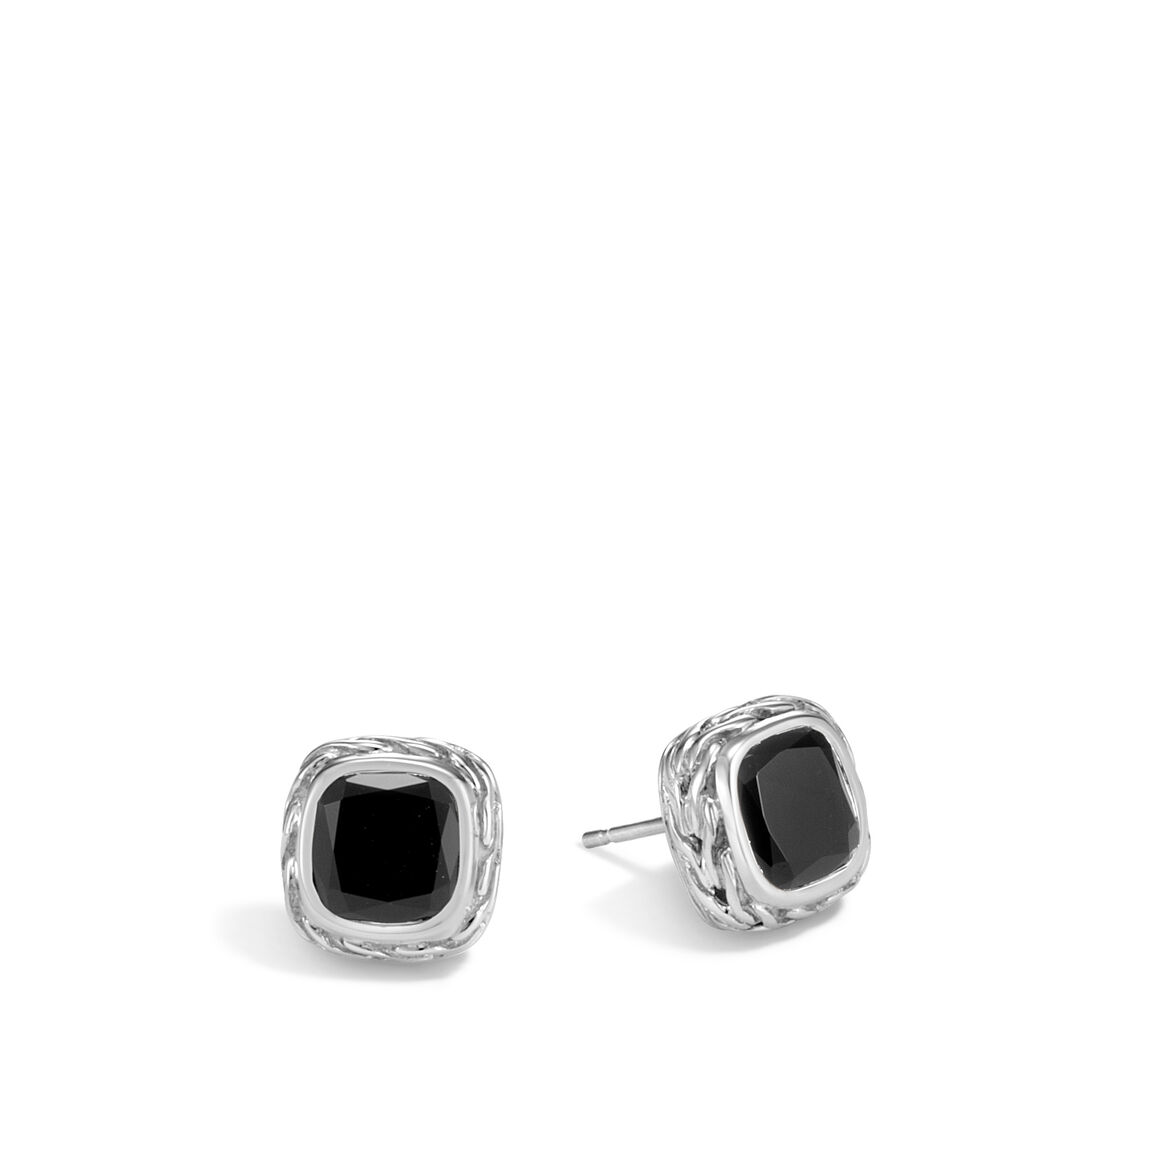 Classic Chain Magic Cut Stud Earring in Silver, 8MM Gemstone